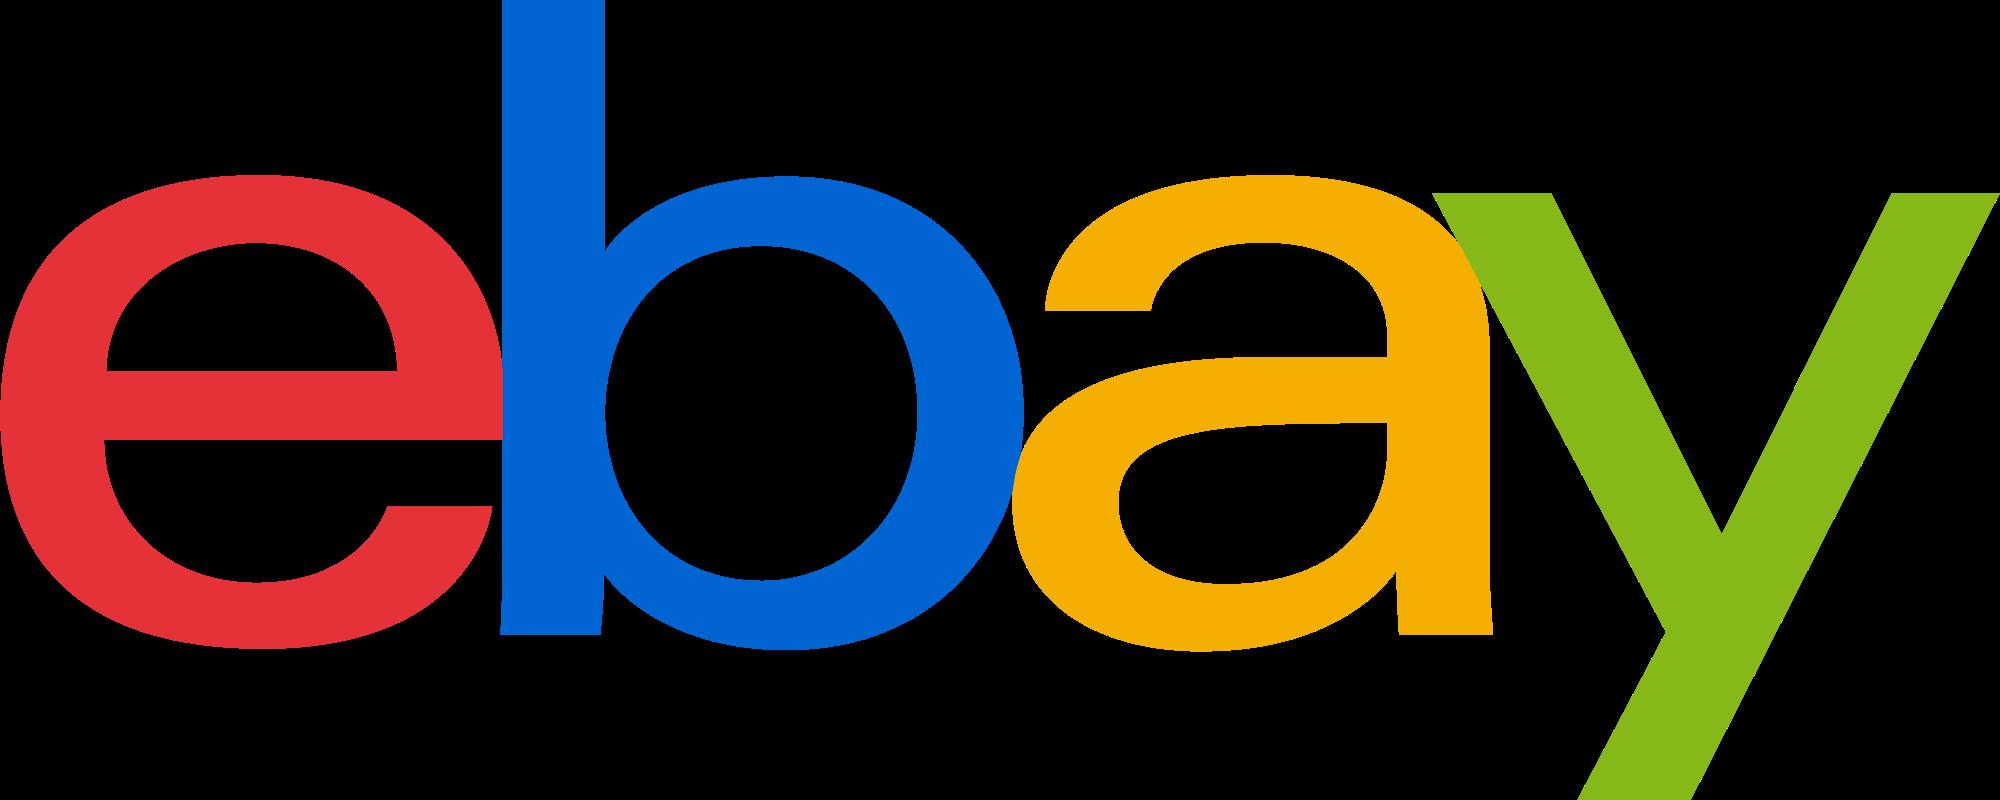 Earn Money with eBay